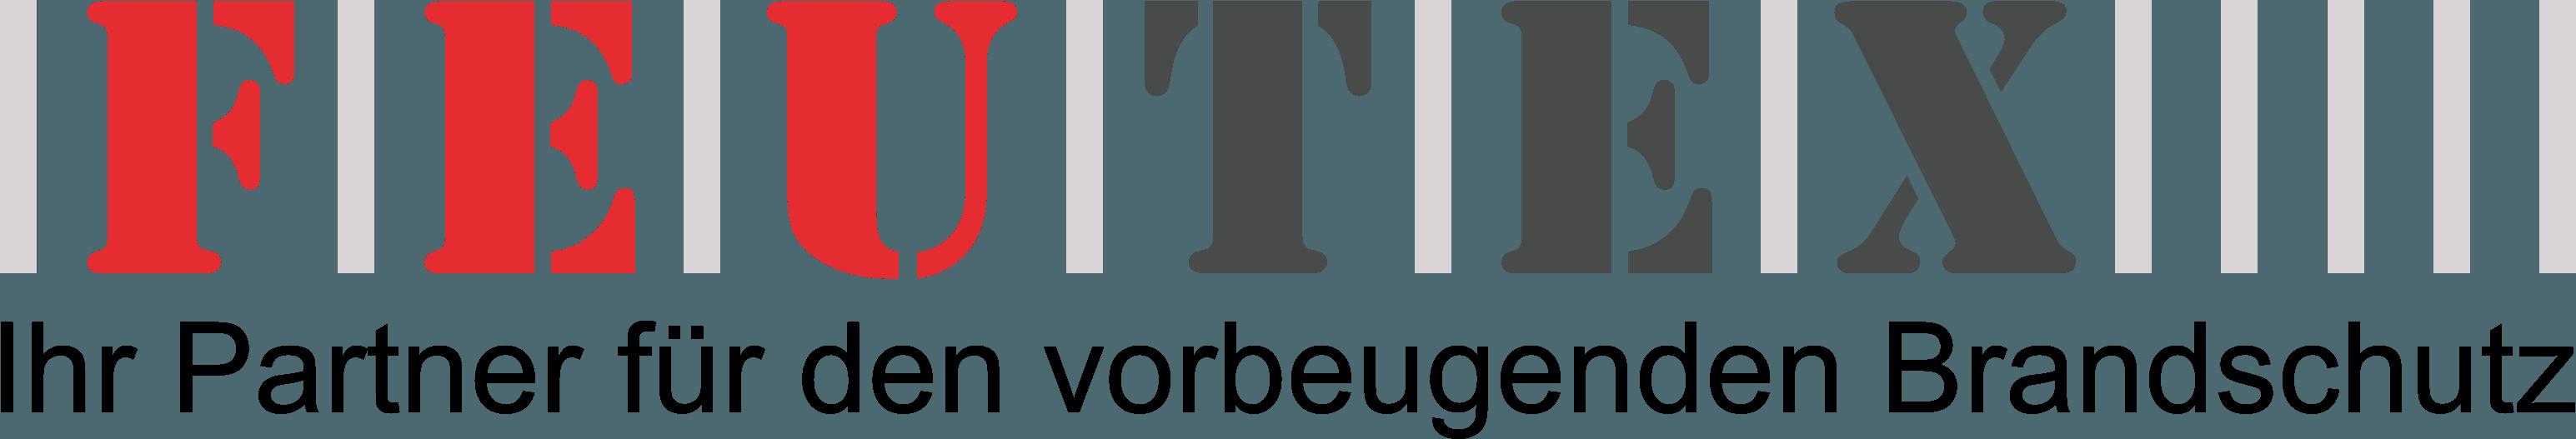 Feutex Brandschutz • Feuerlöscher • Service